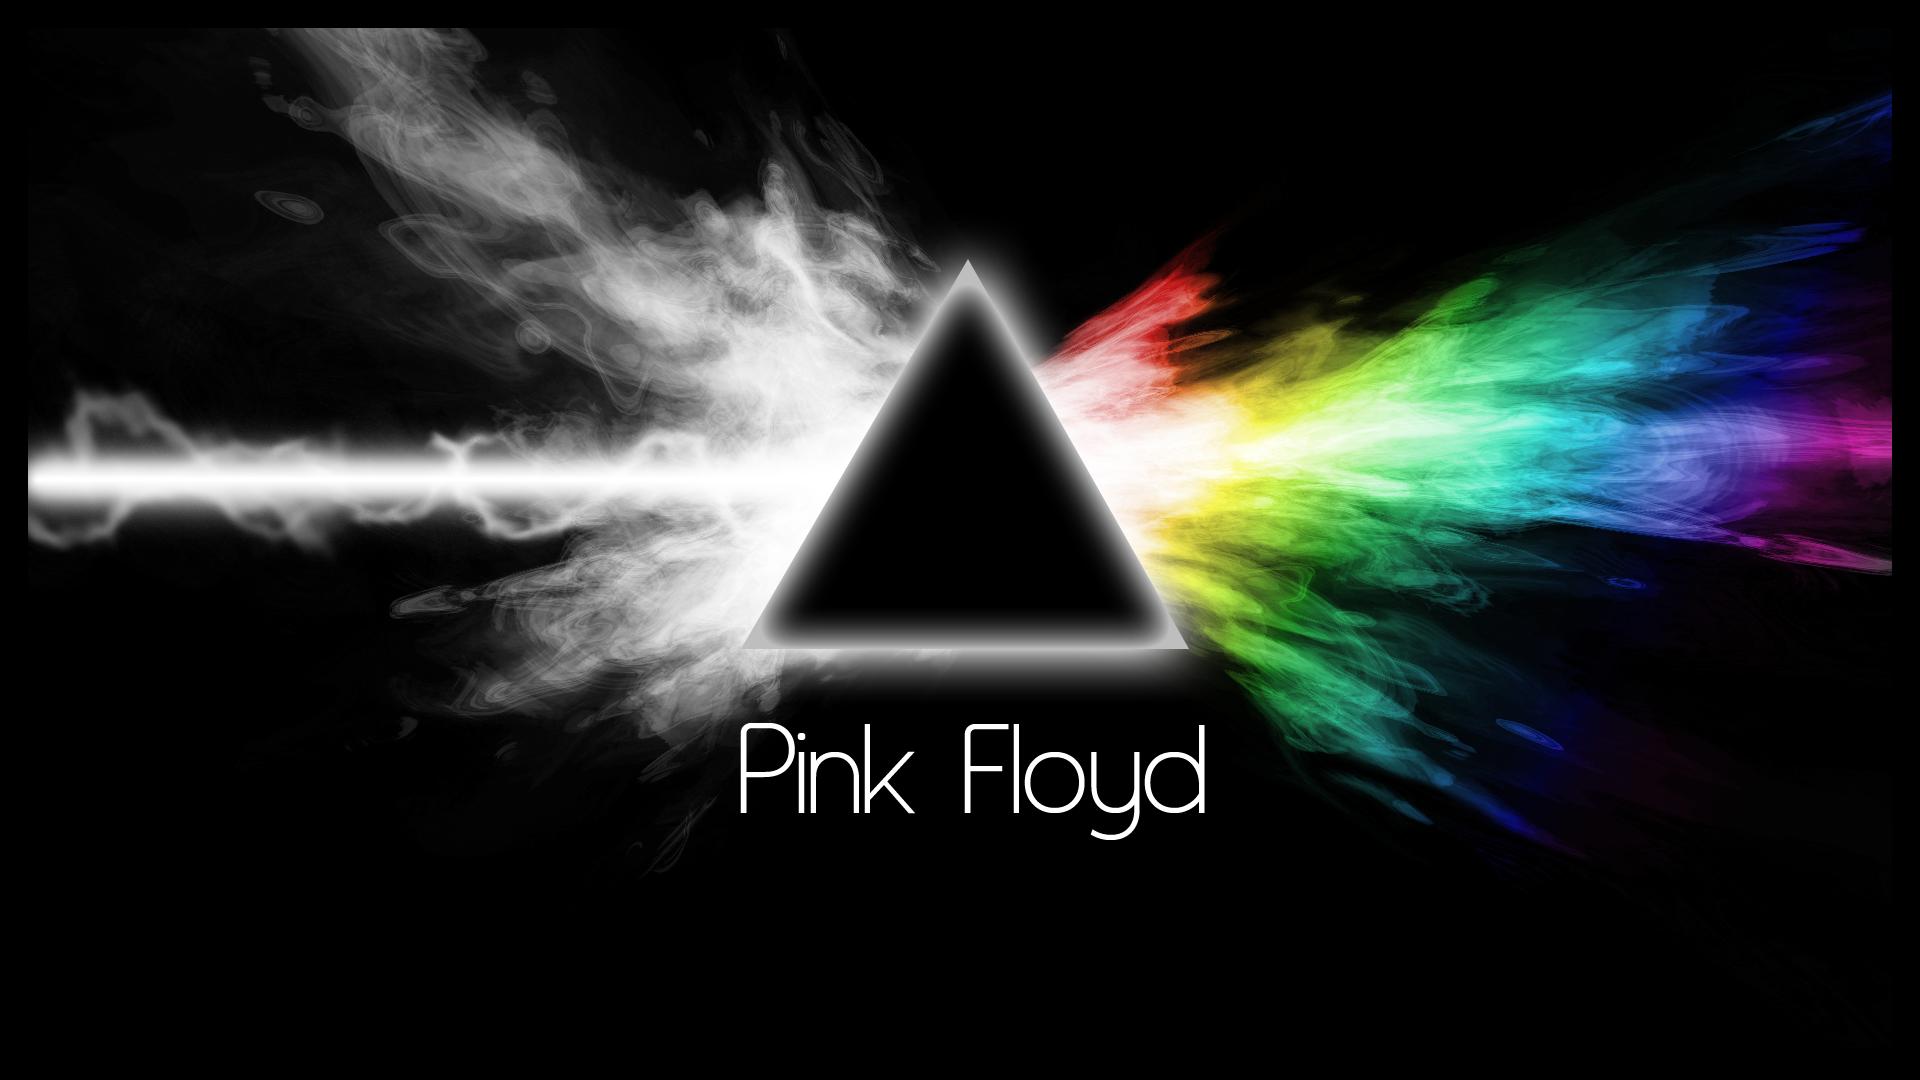 Google themes pink floyd - Google Themes Pink Floyd 0